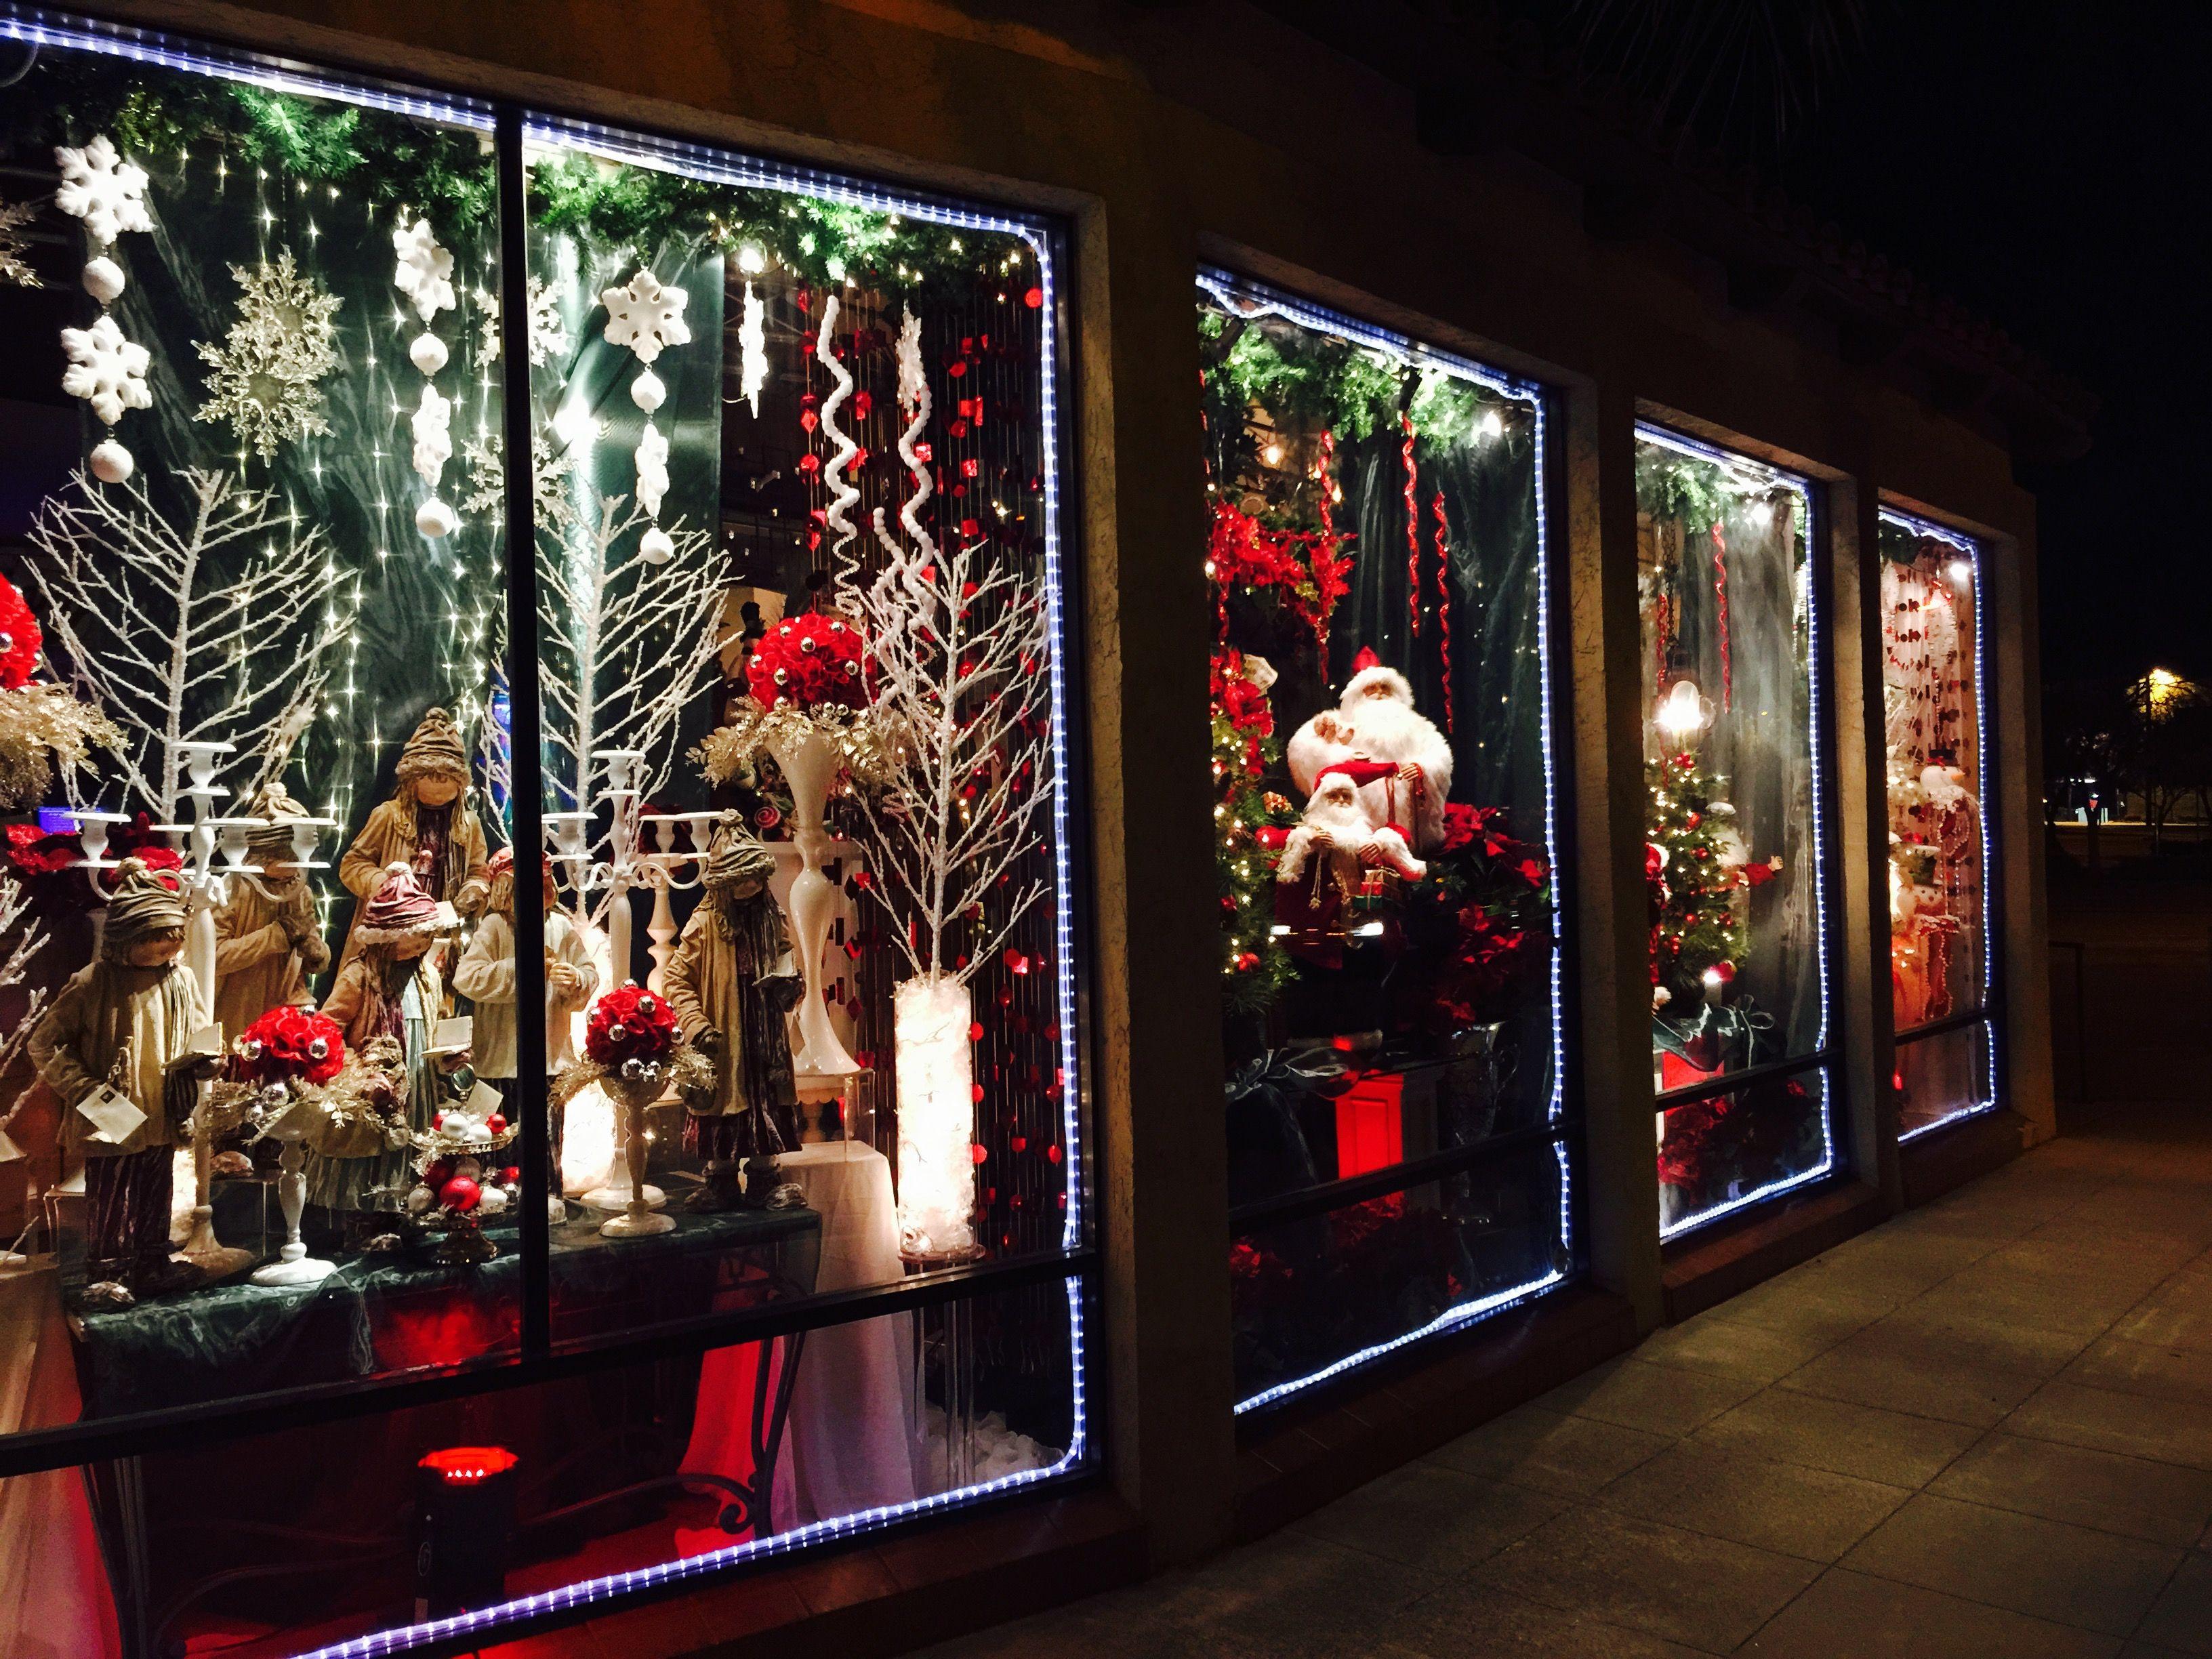 Window Art Window Display Flower Shop Holiday Decor Event